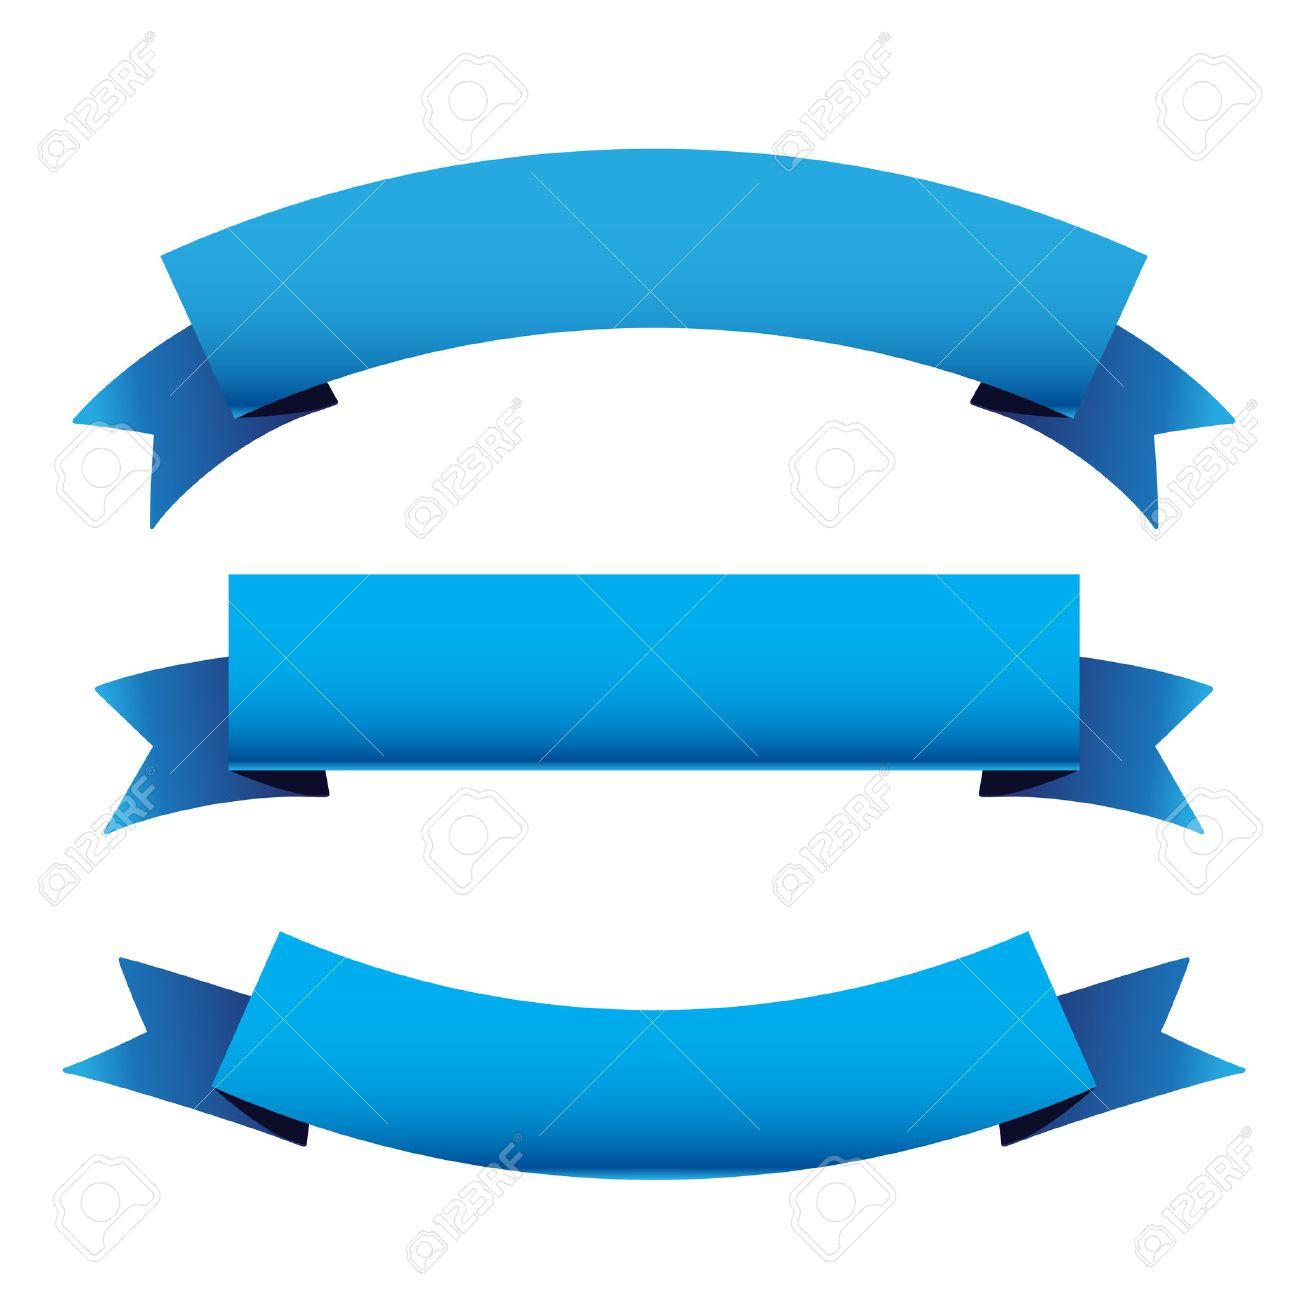 blue ribbon set royalty free cliparts vectors and stock rh 123rf com blue ribbon vector illustrator pabst blue ribbon vector